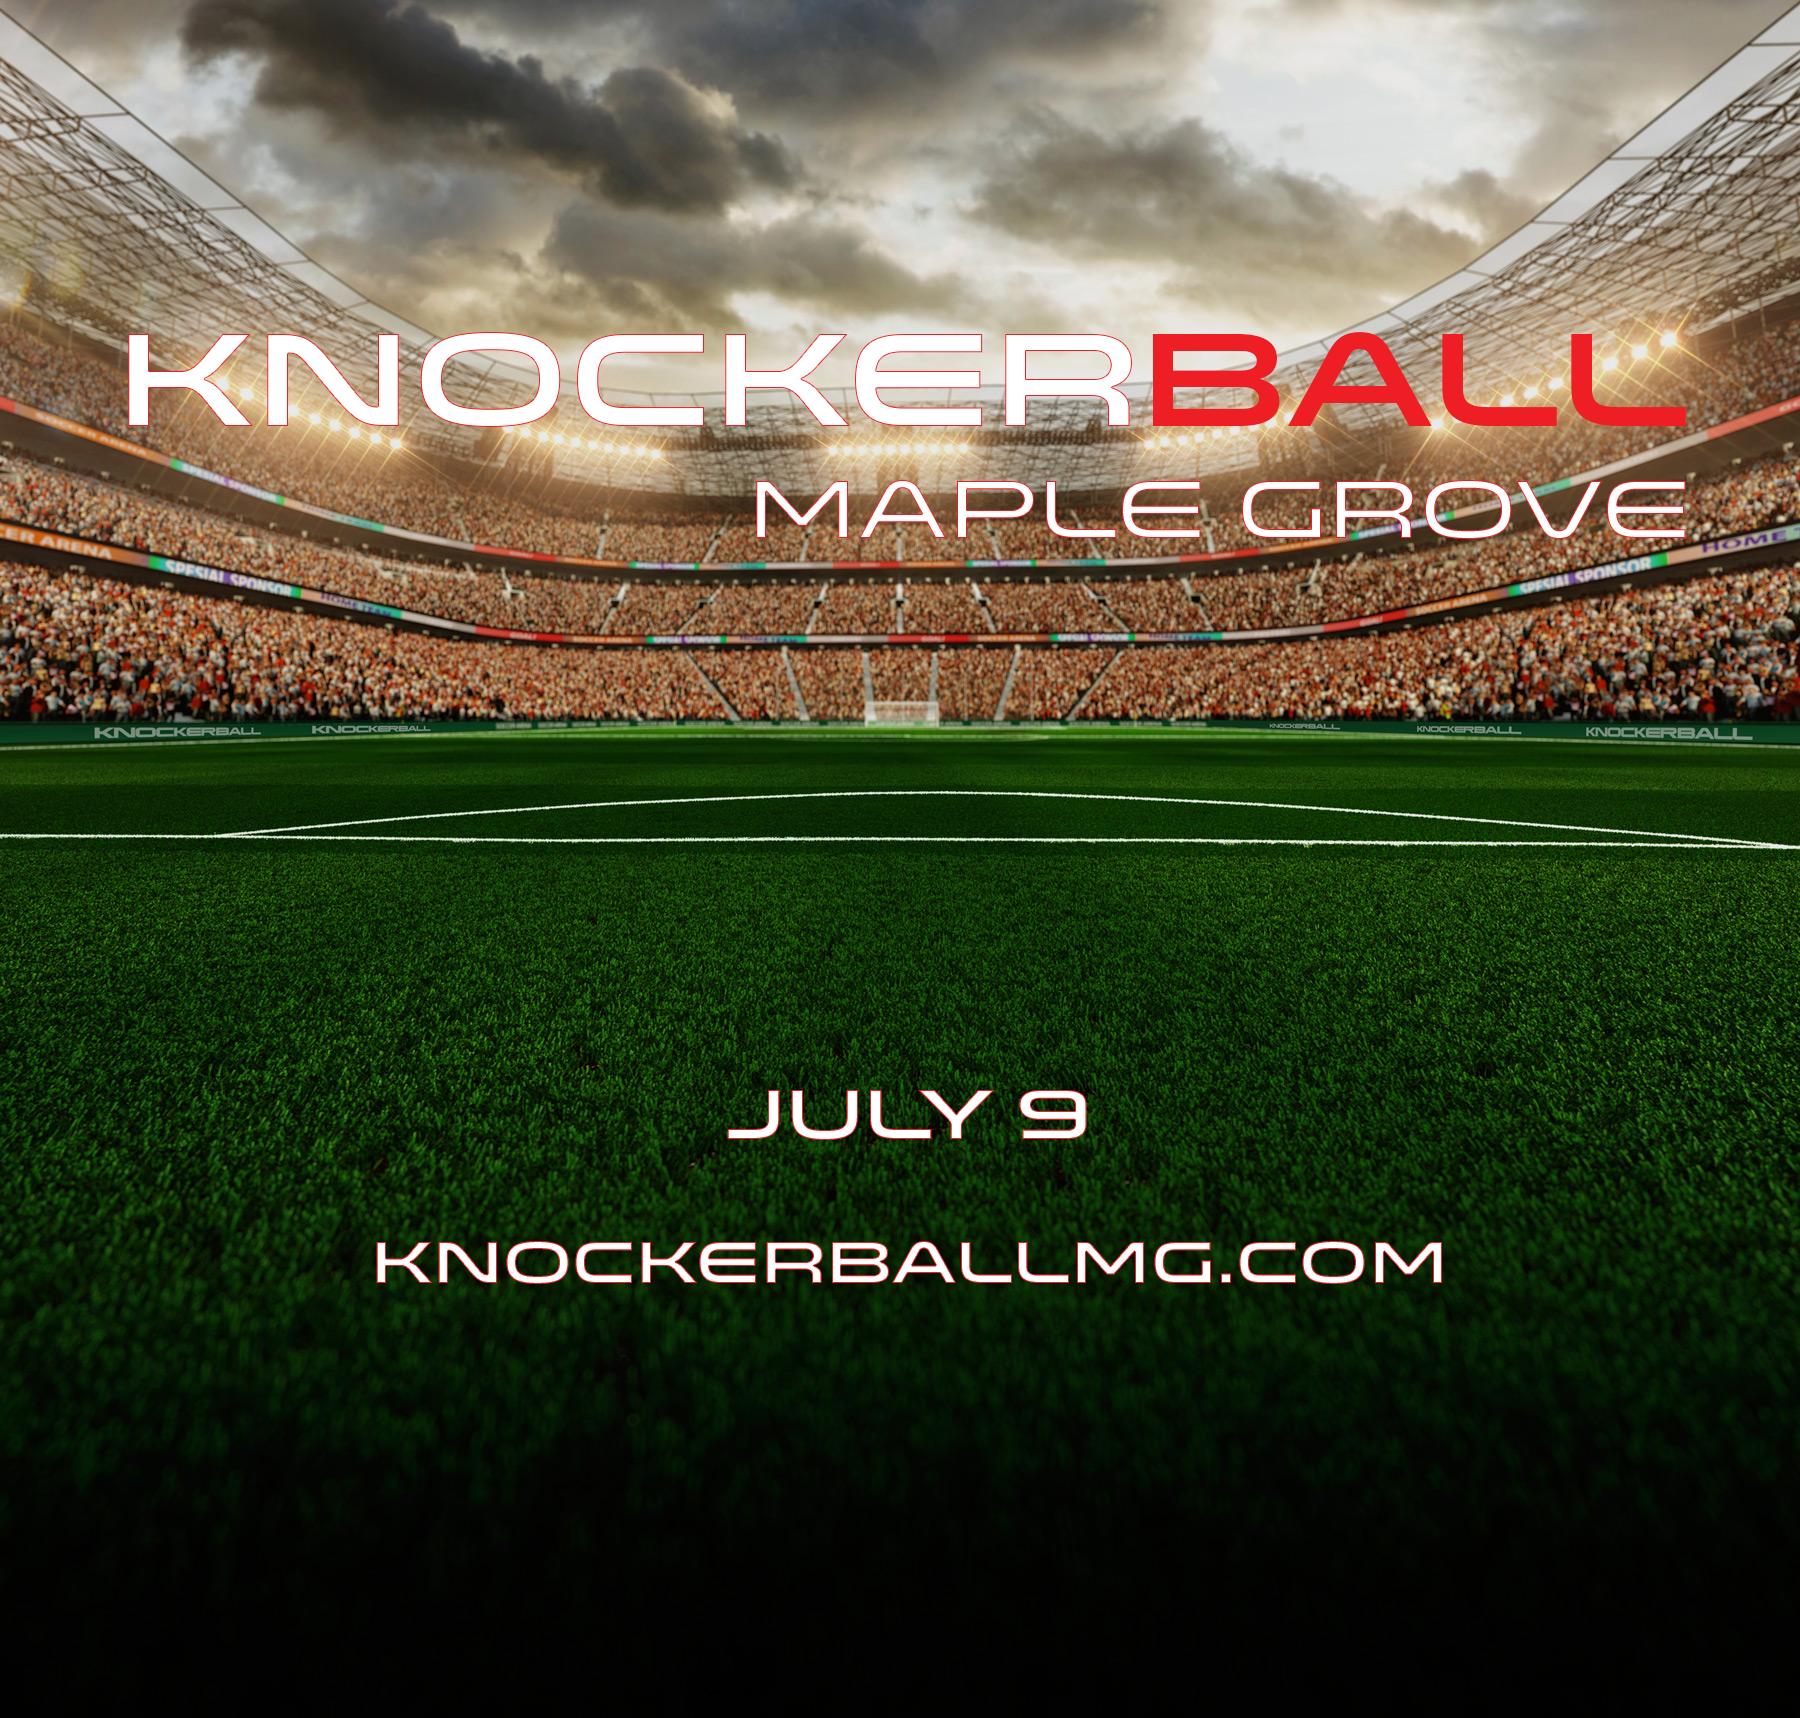 Knockerball Instagram.png